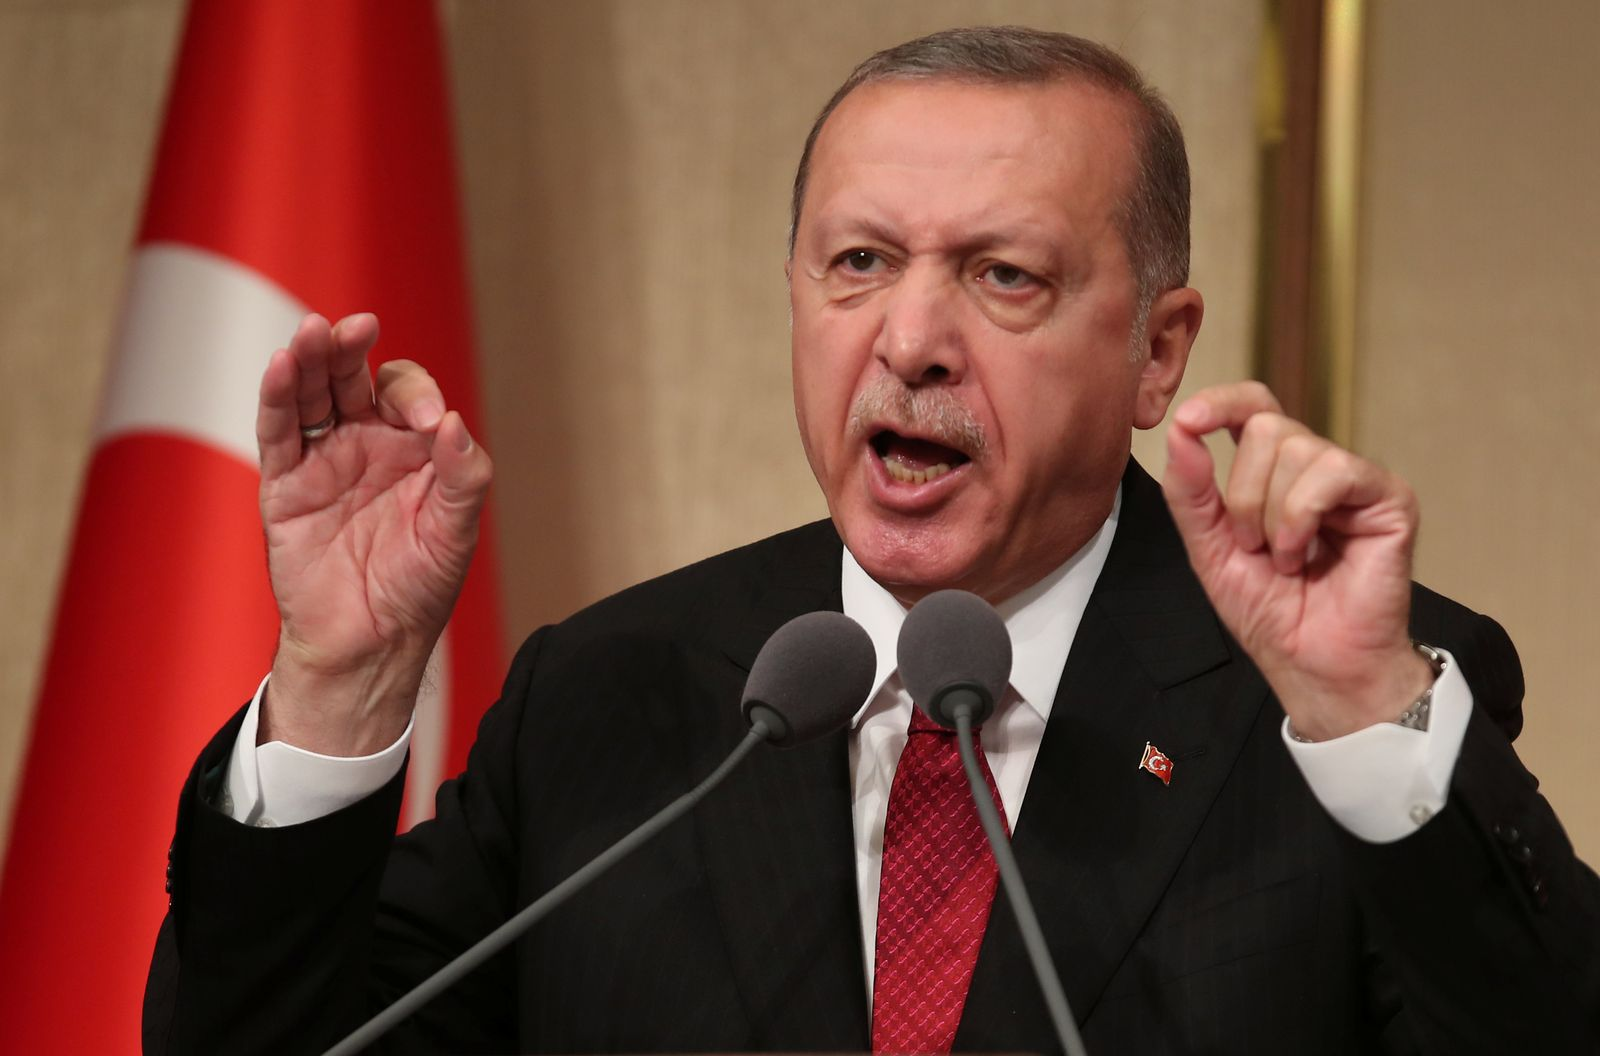 TURKEY-POLITICS/PRESIDENT